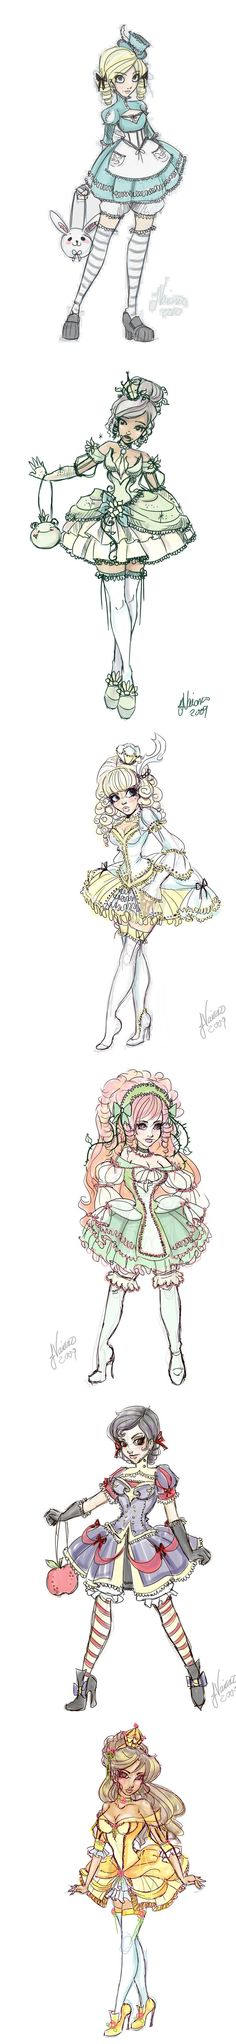 Lolita disney characters